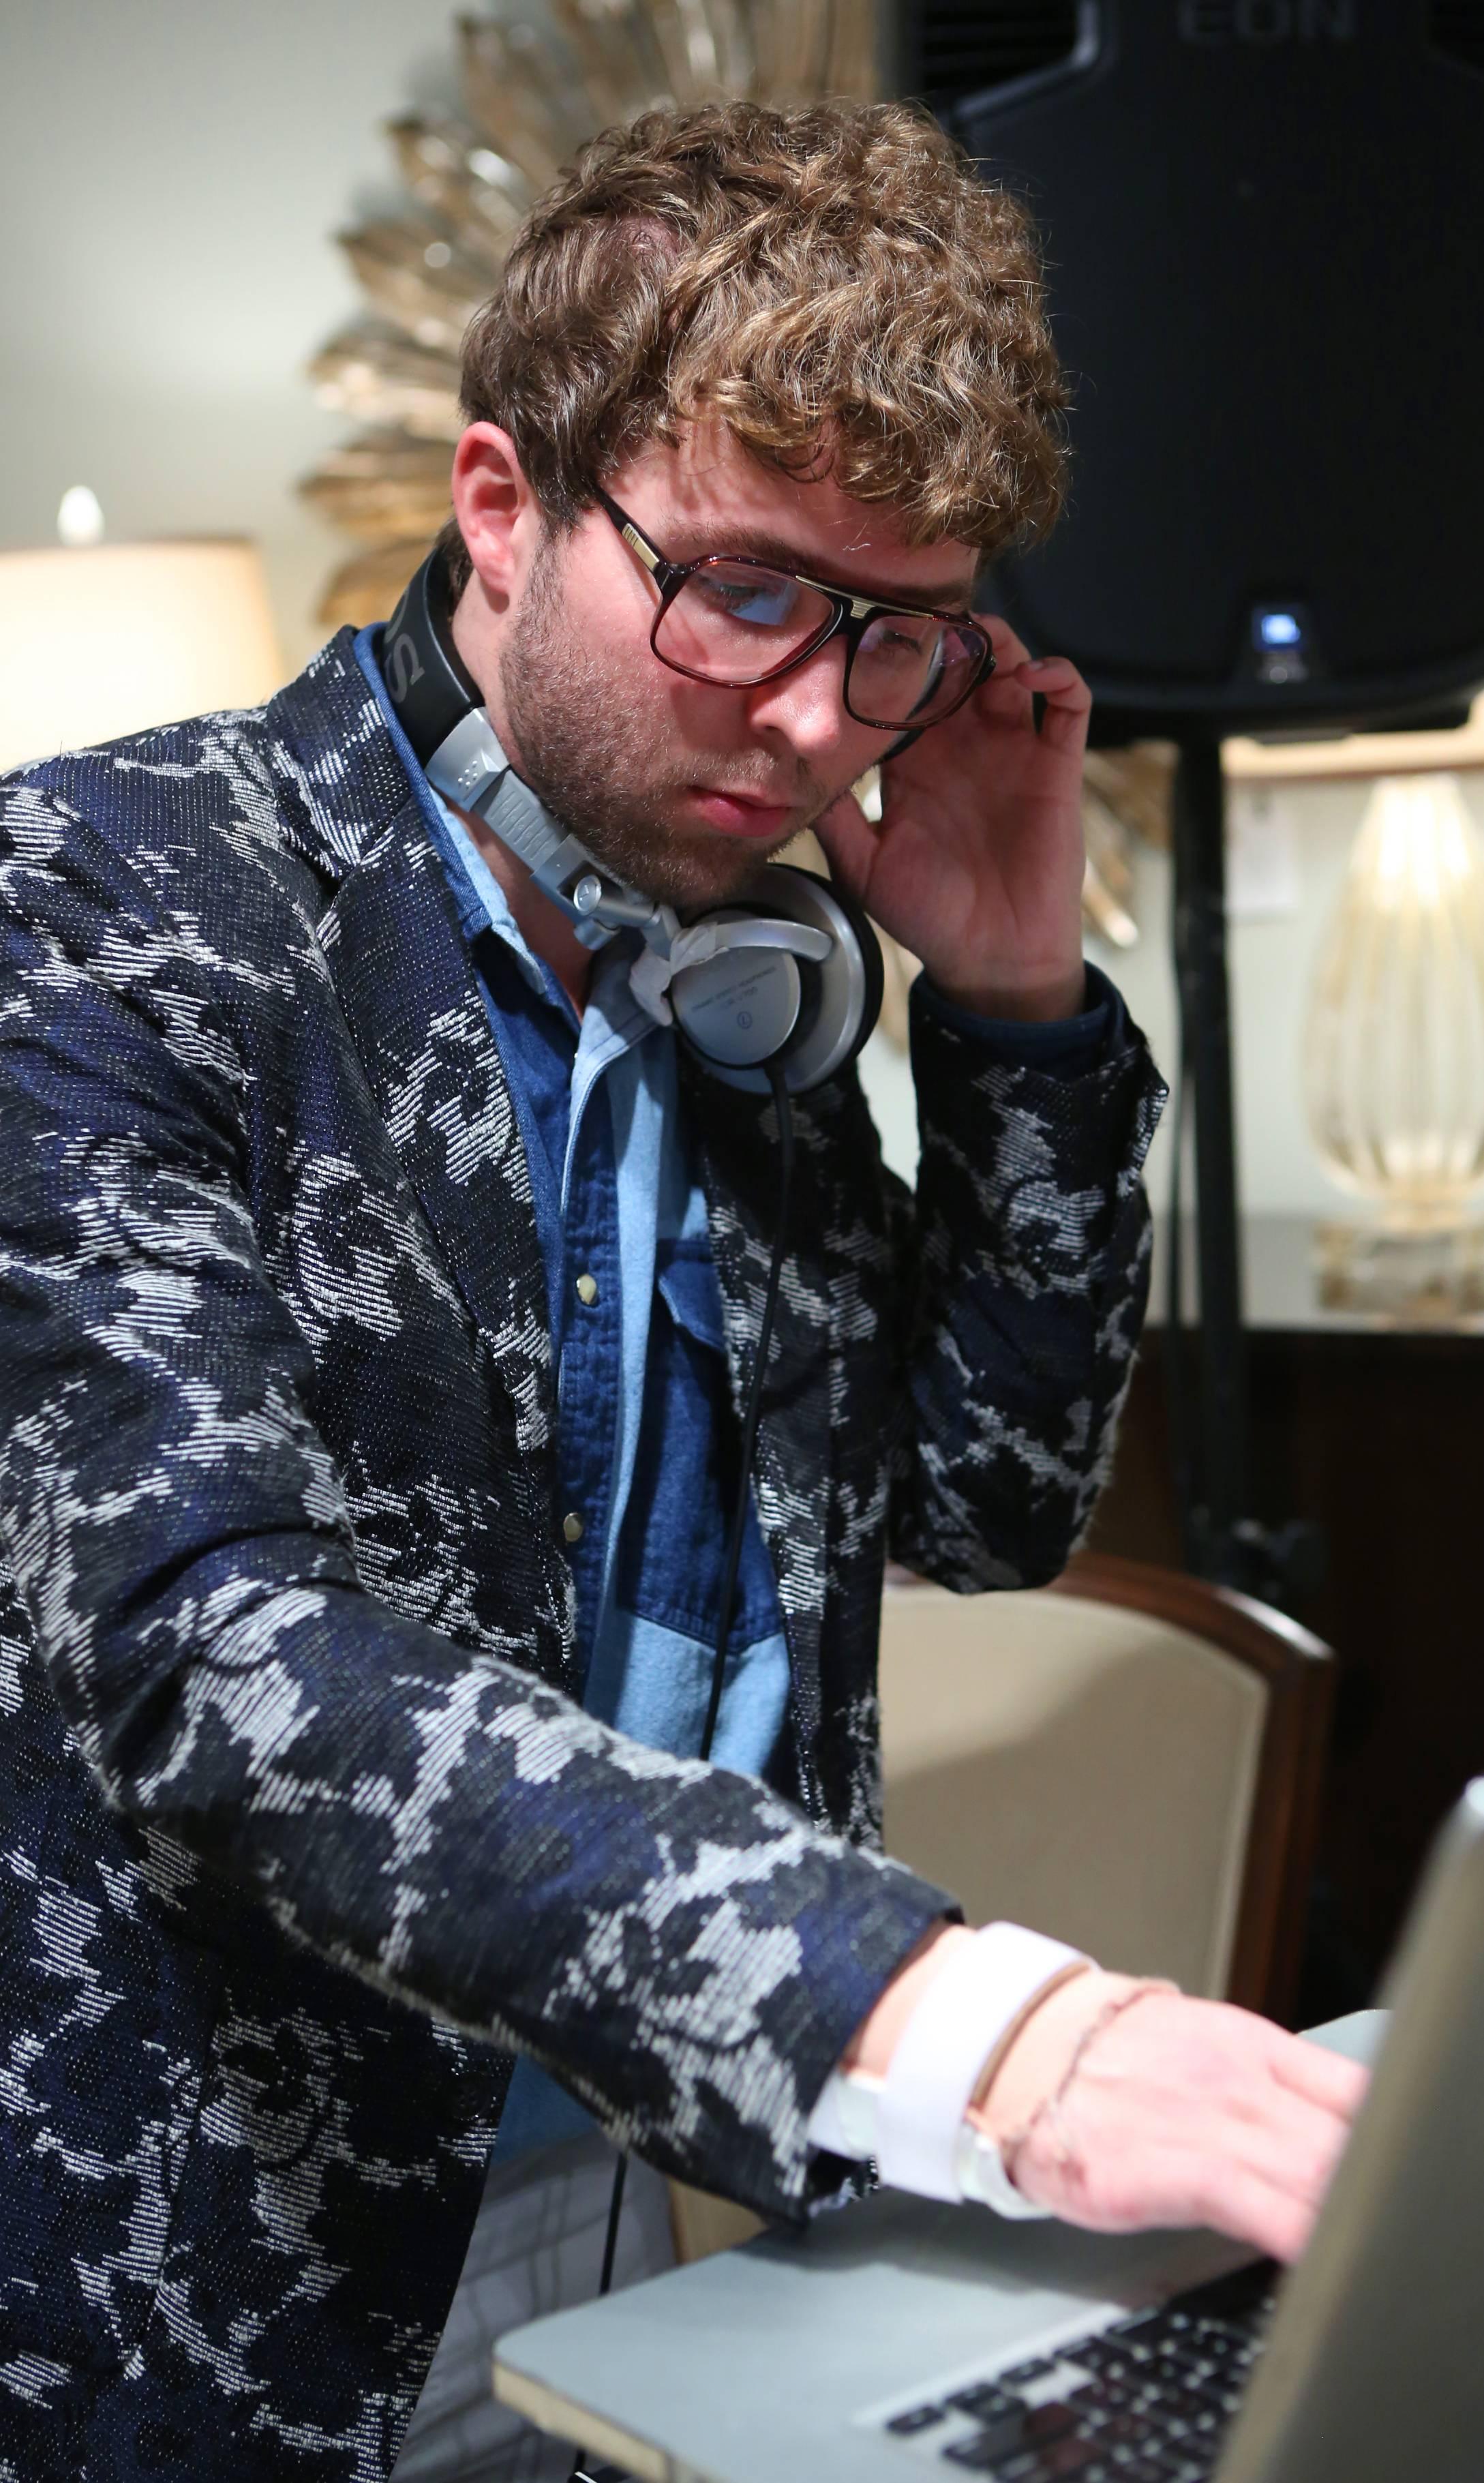 DJ Timo Weiland